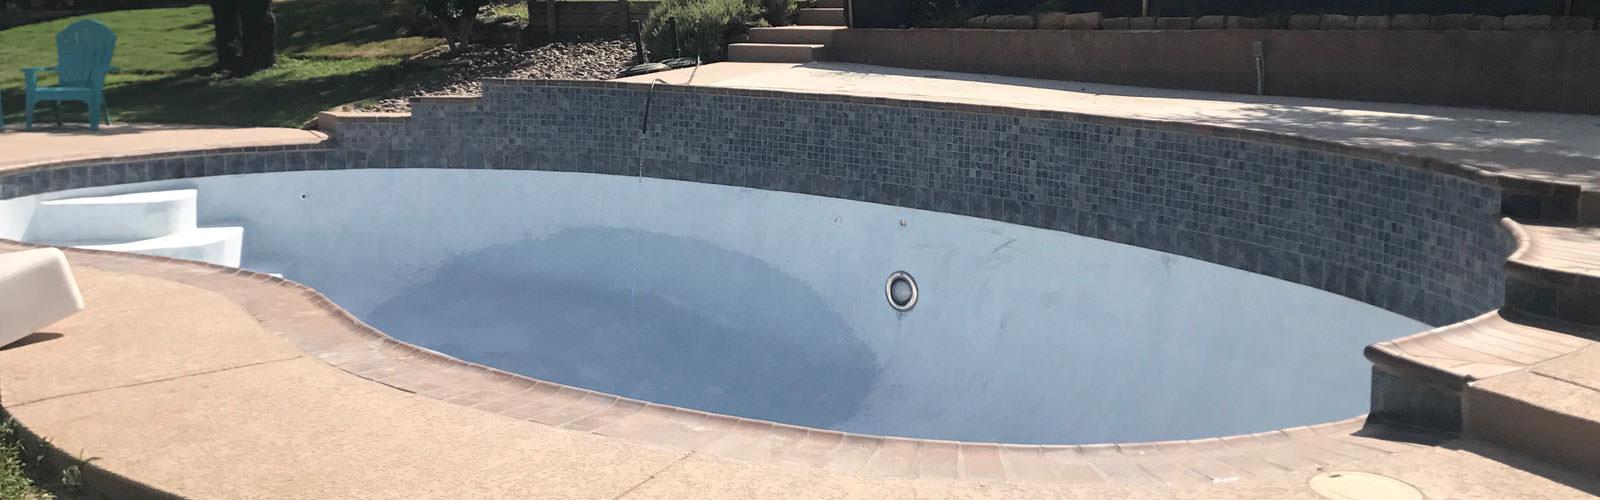 Pool Resurfacing And Repair Experts In Dallas Fort Worth